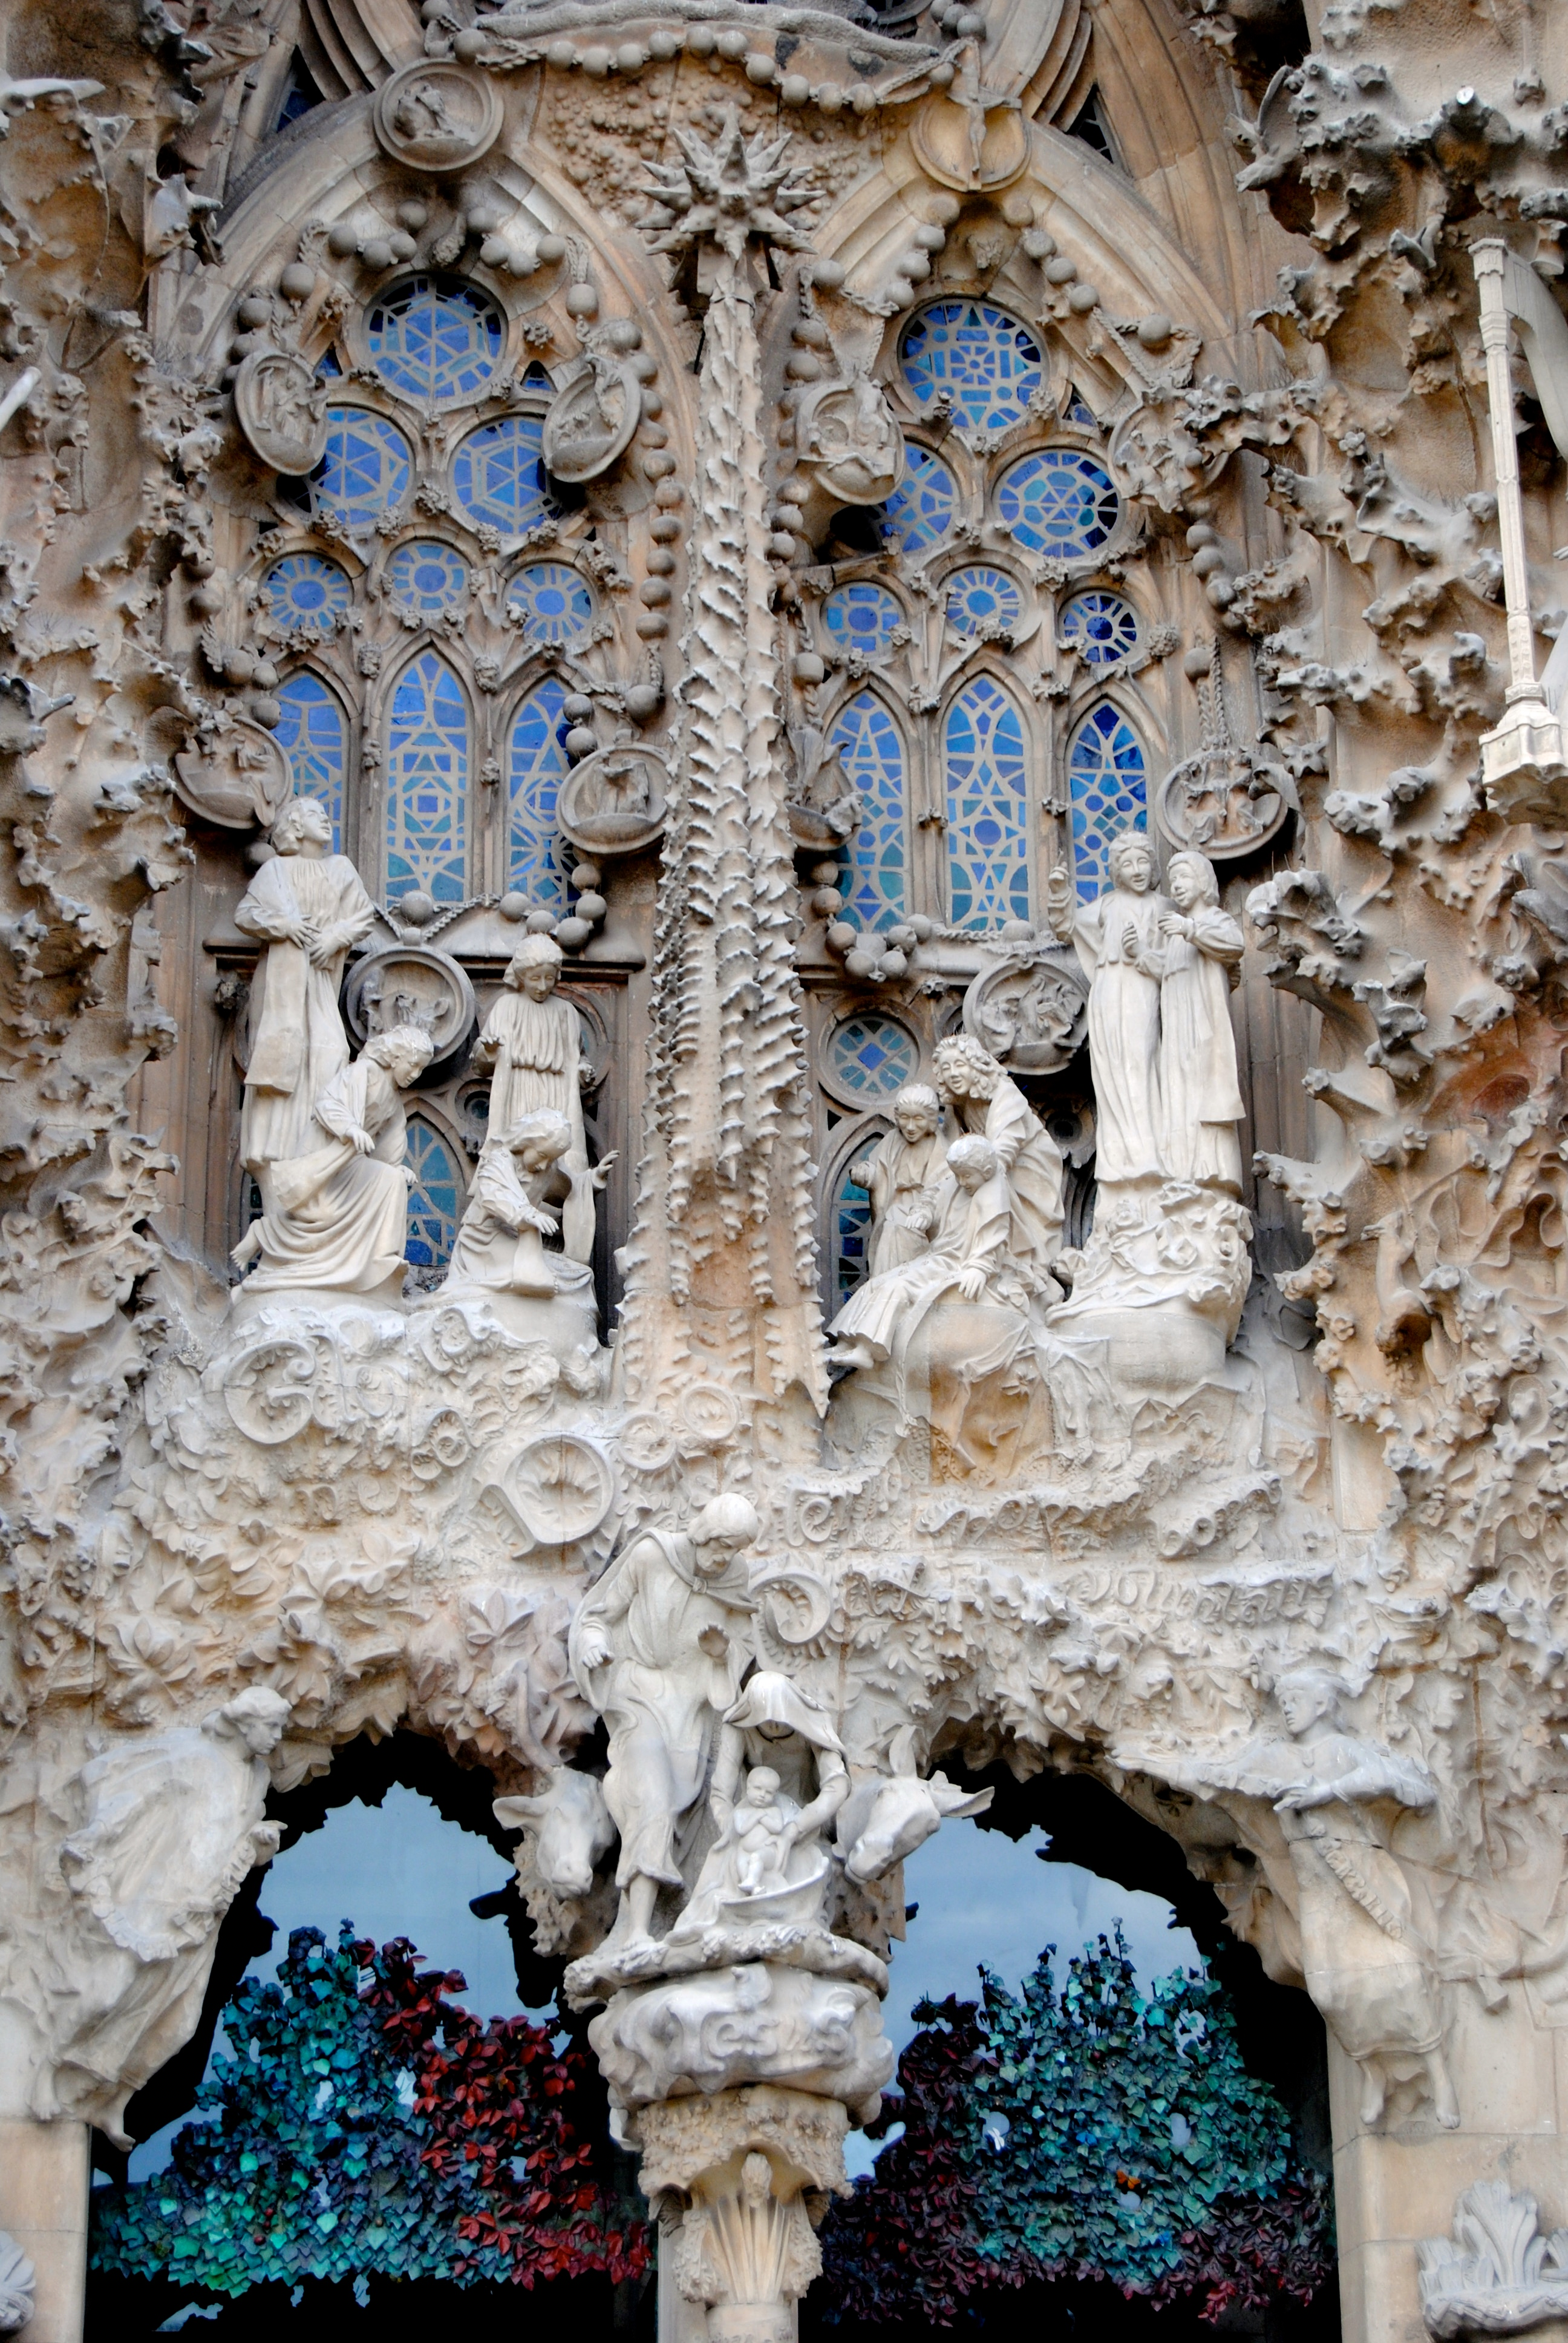 Nativity Scene exterior of the Sagrada Familia.